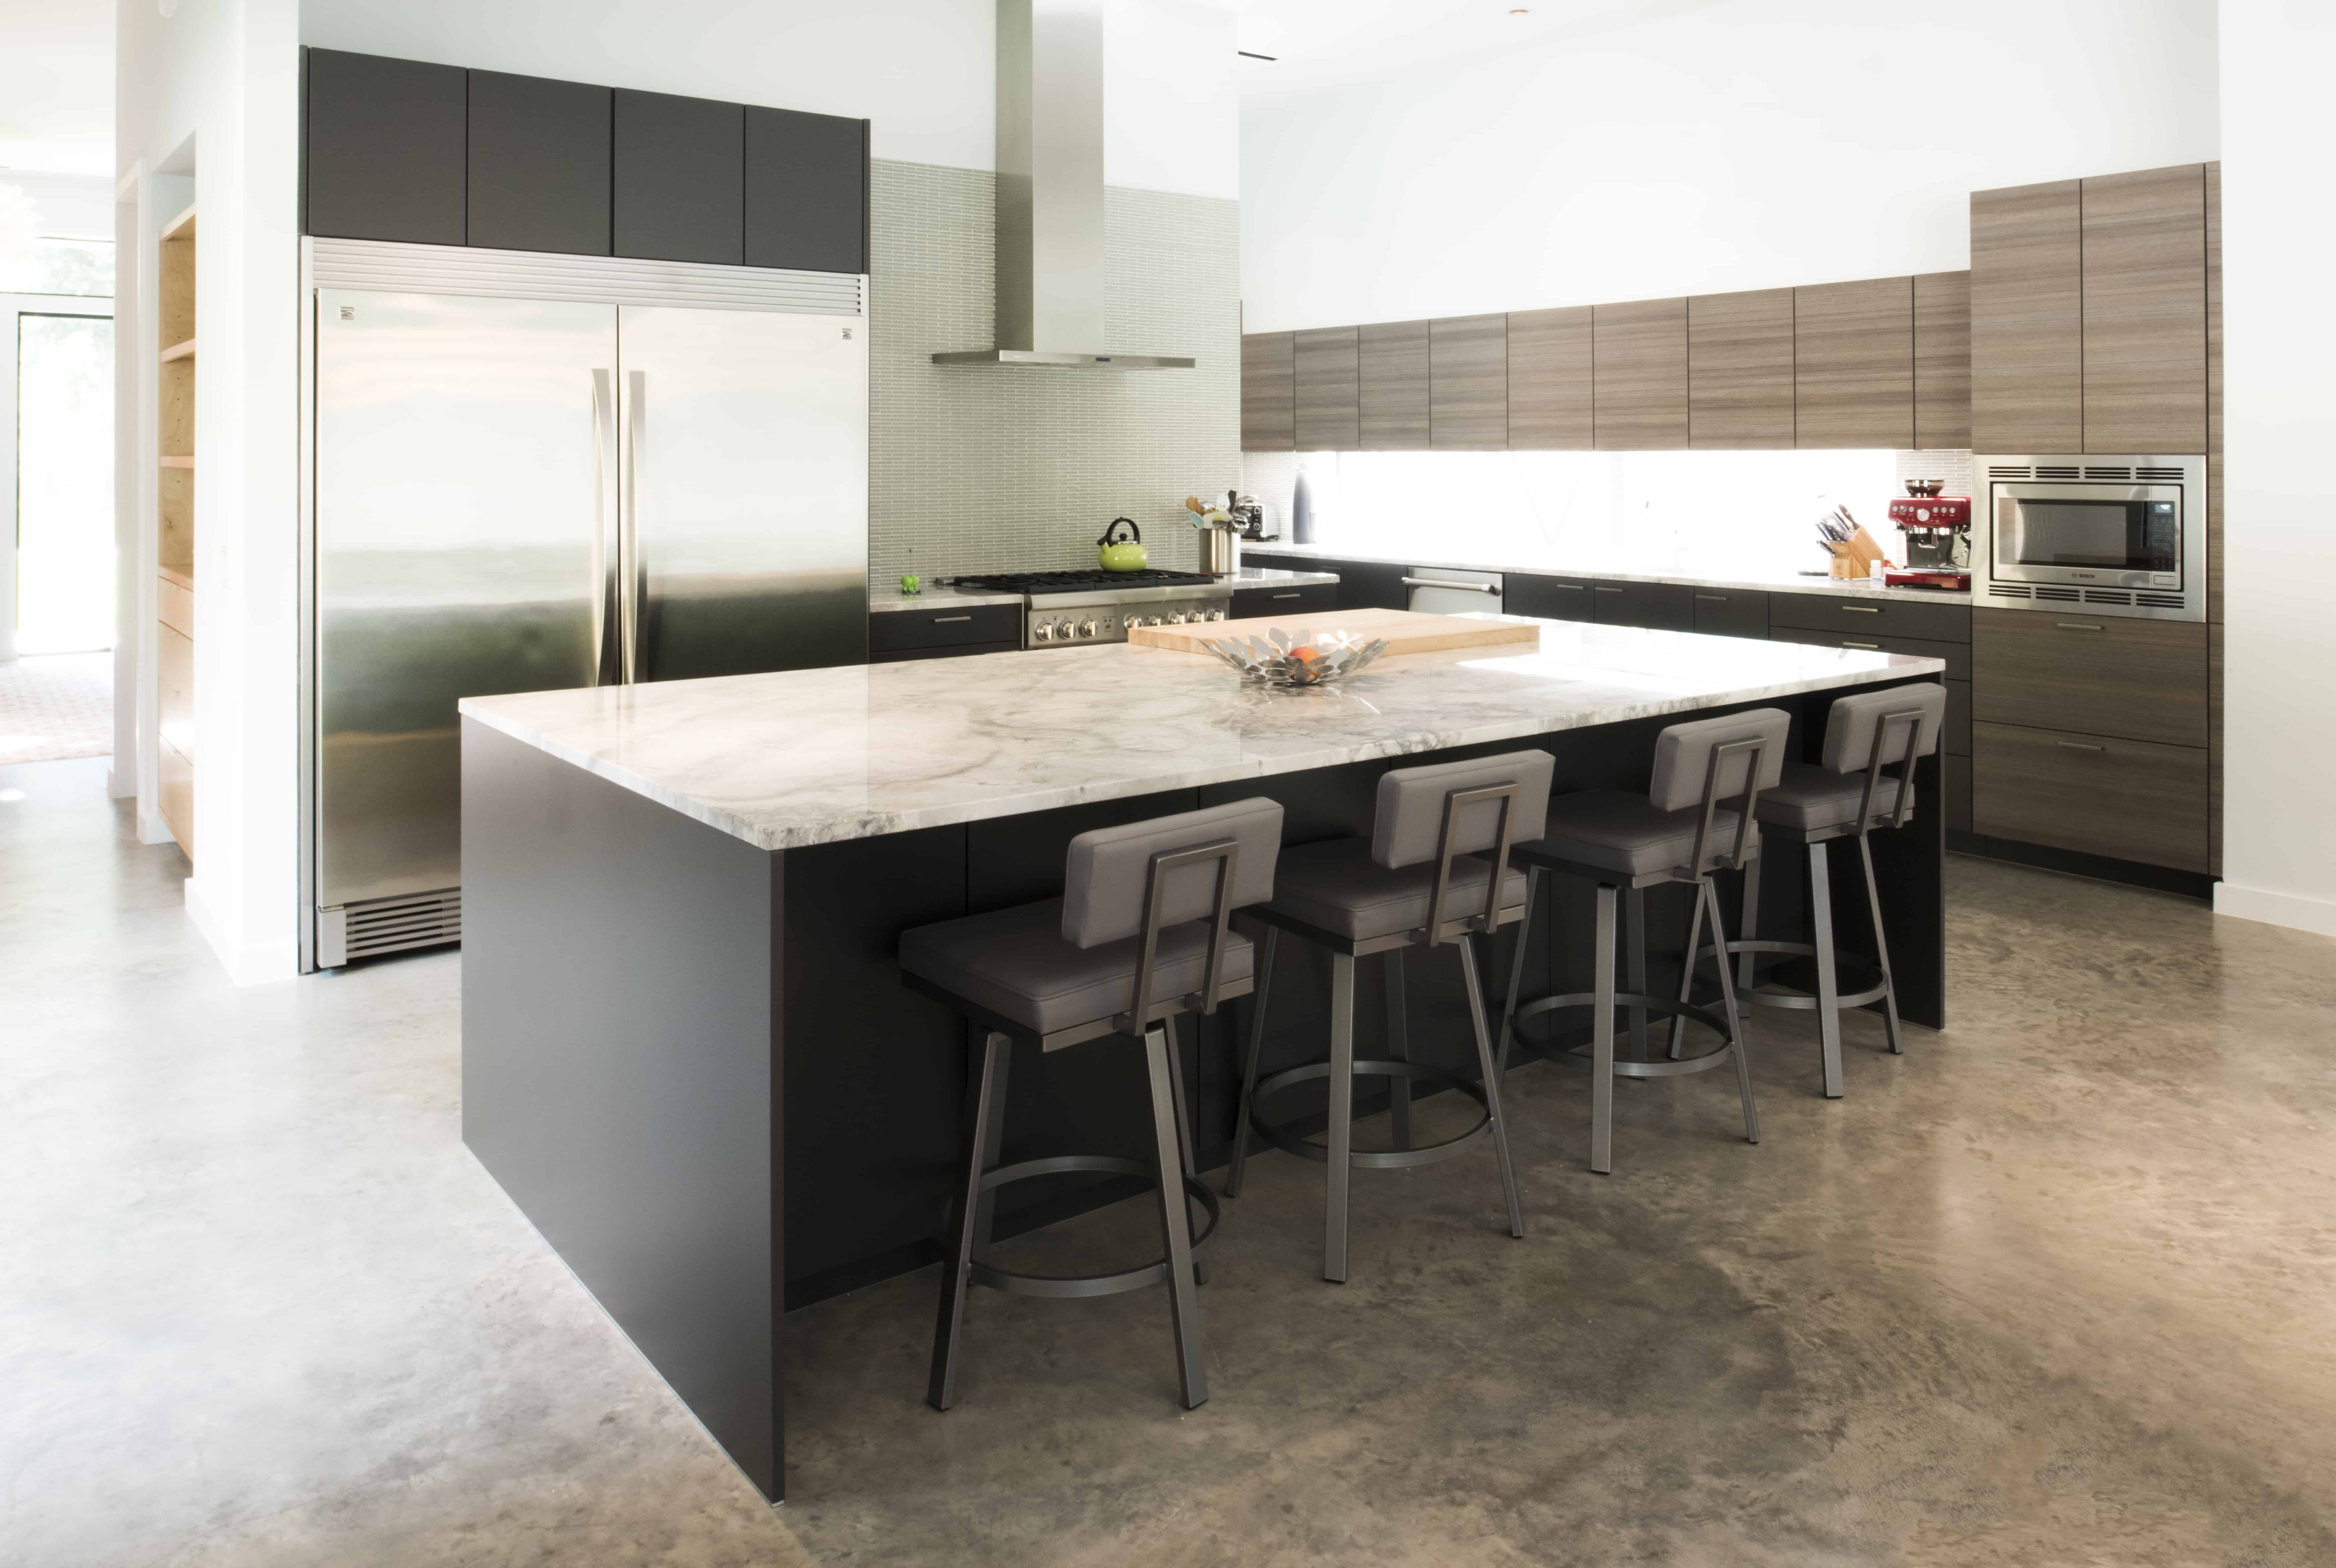 Garden Oaks Modern kitchen with natural quartzite island